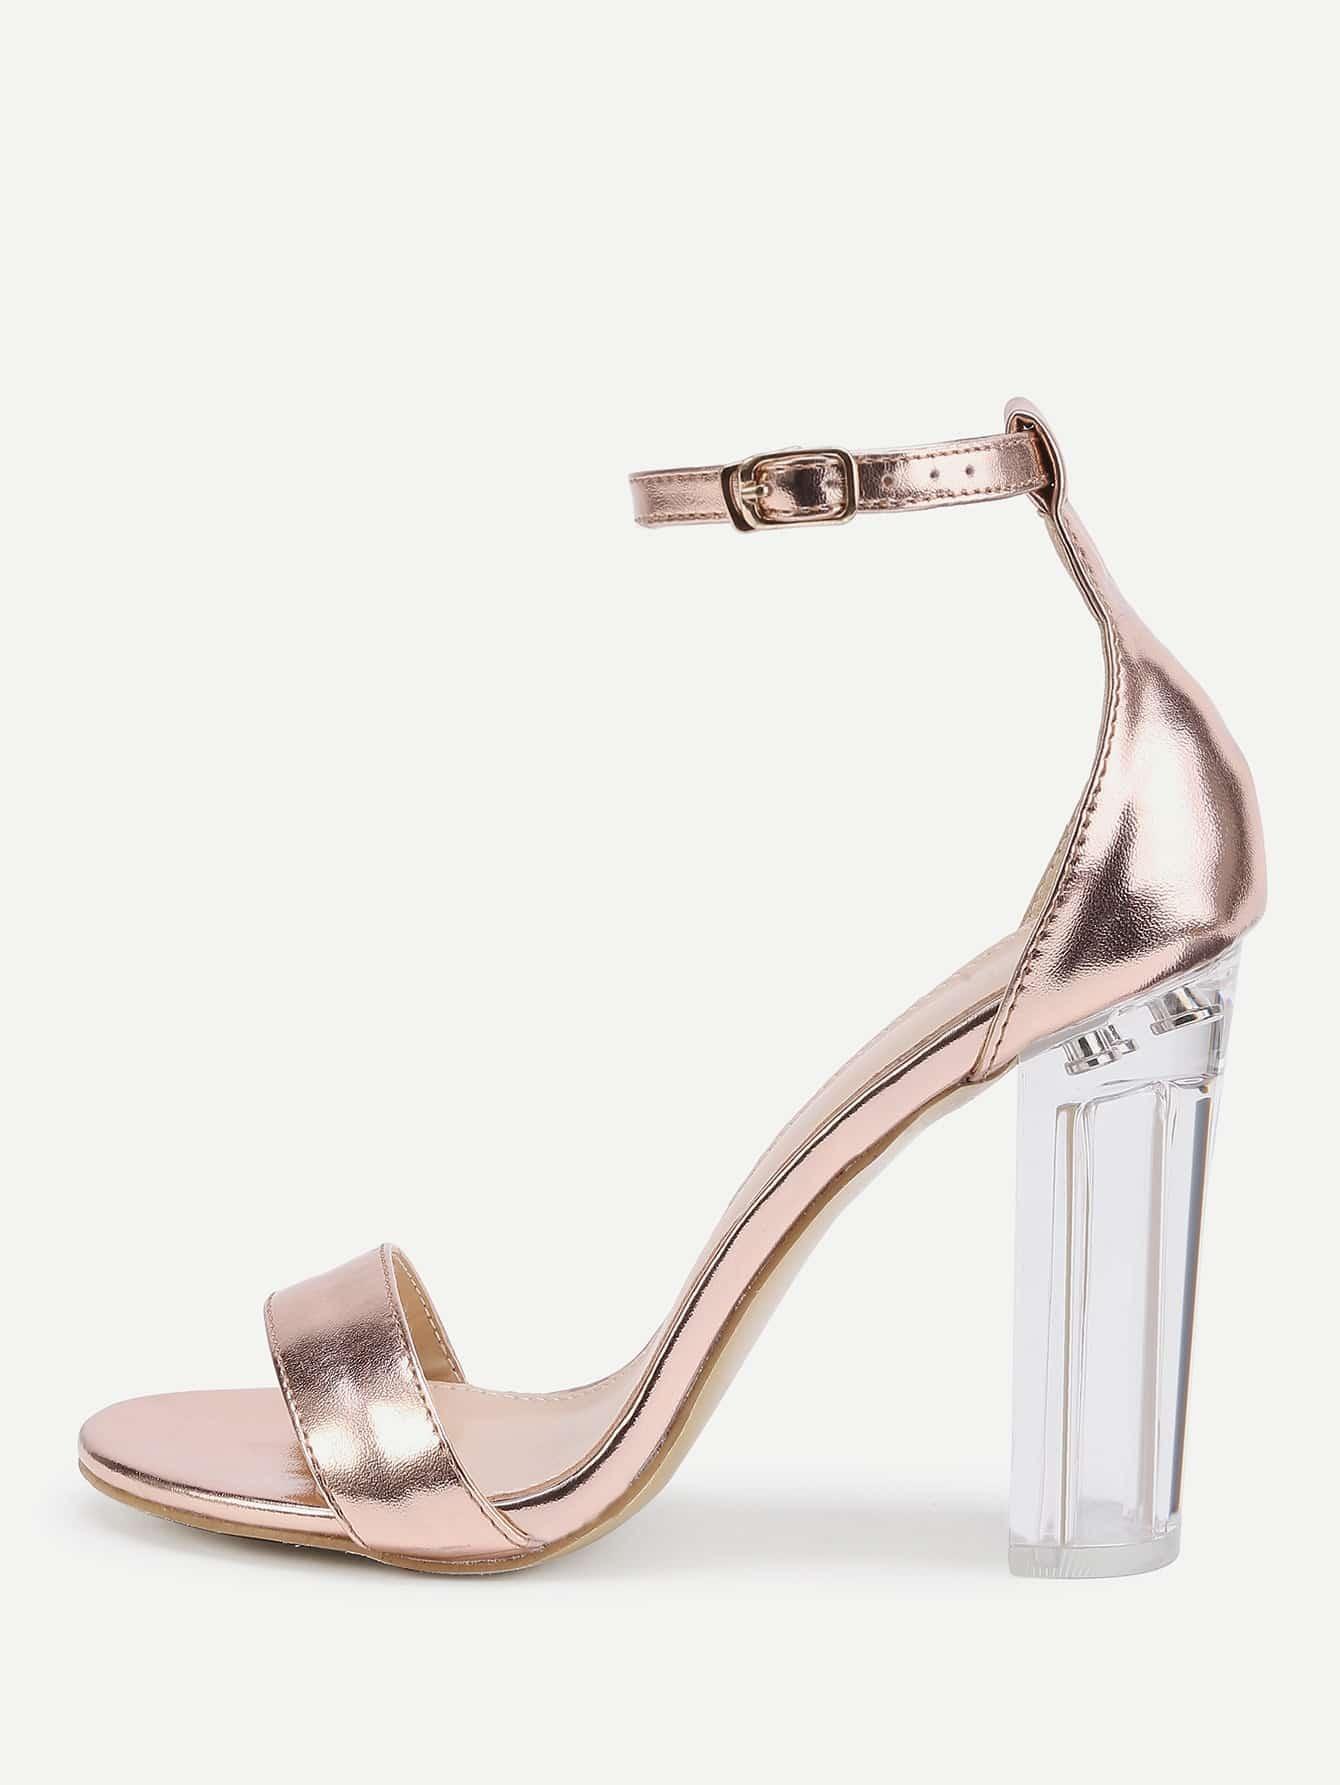 high heel shoe chair value city folding wood rose gold lucite sandals shein sheinside